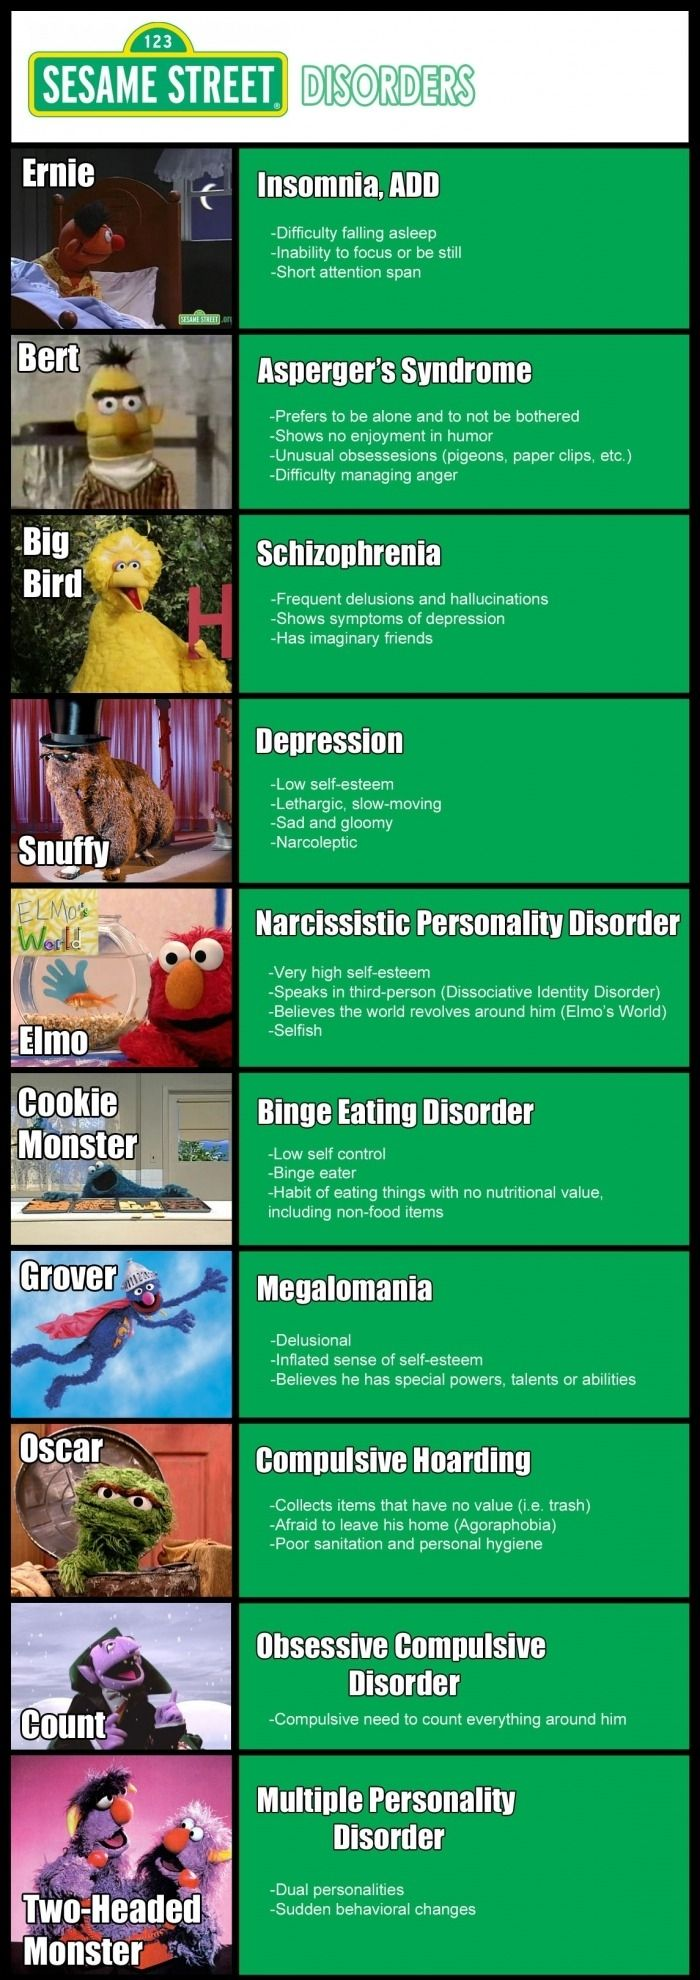 Sesame Street Disorders. First so Winnie the pooh now seamen street